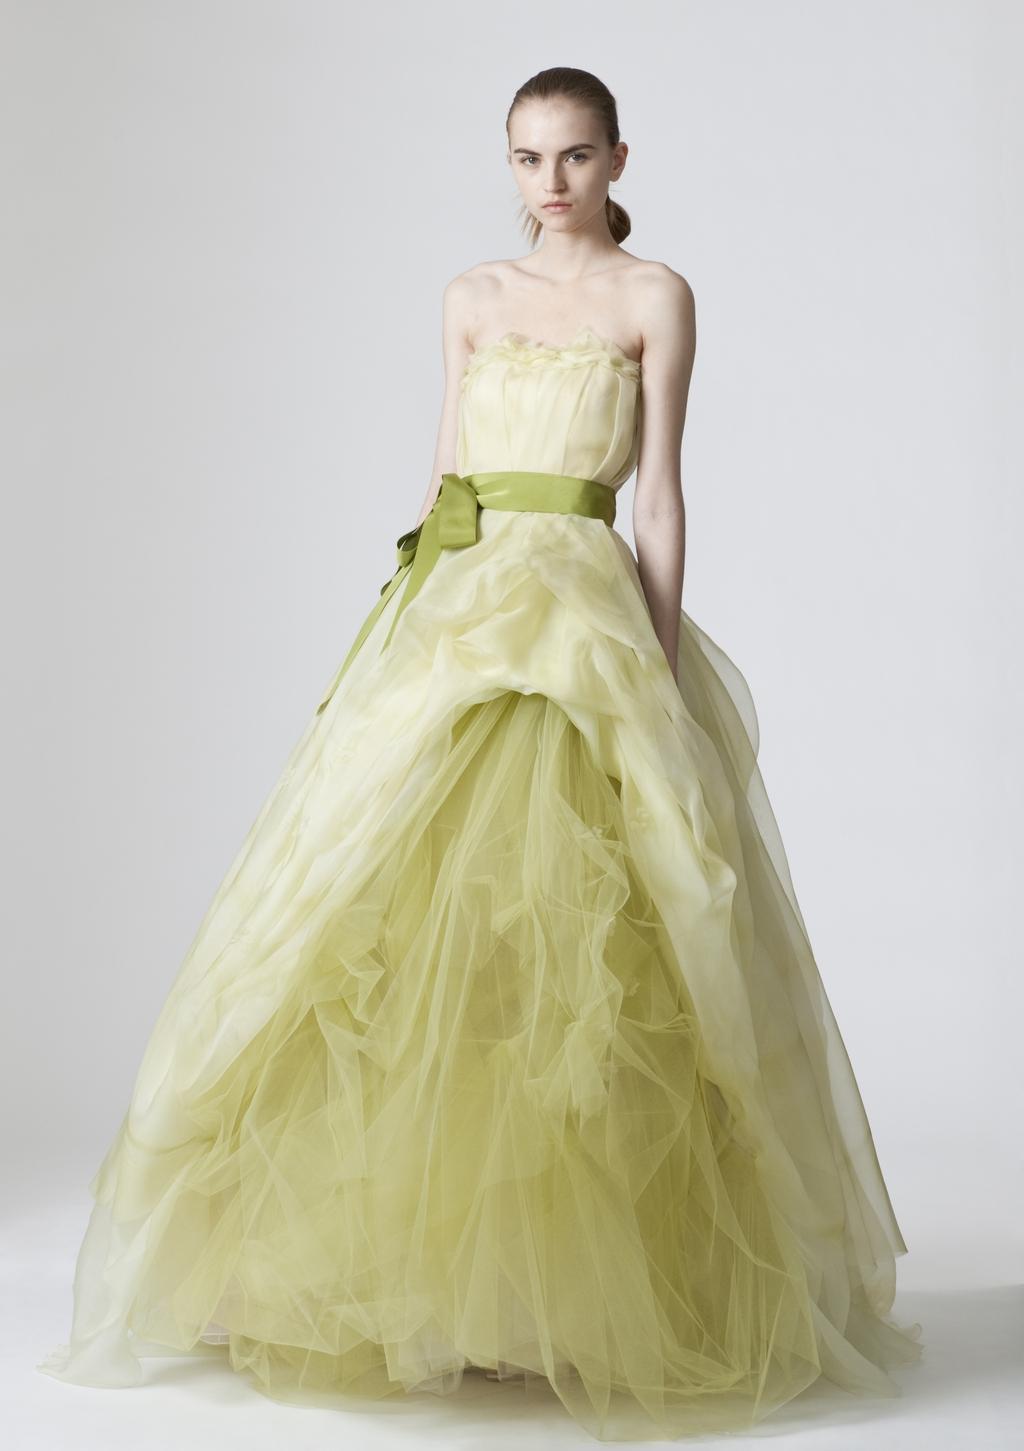 Vera-wang-wedding-dresses-spring-2010-9.full